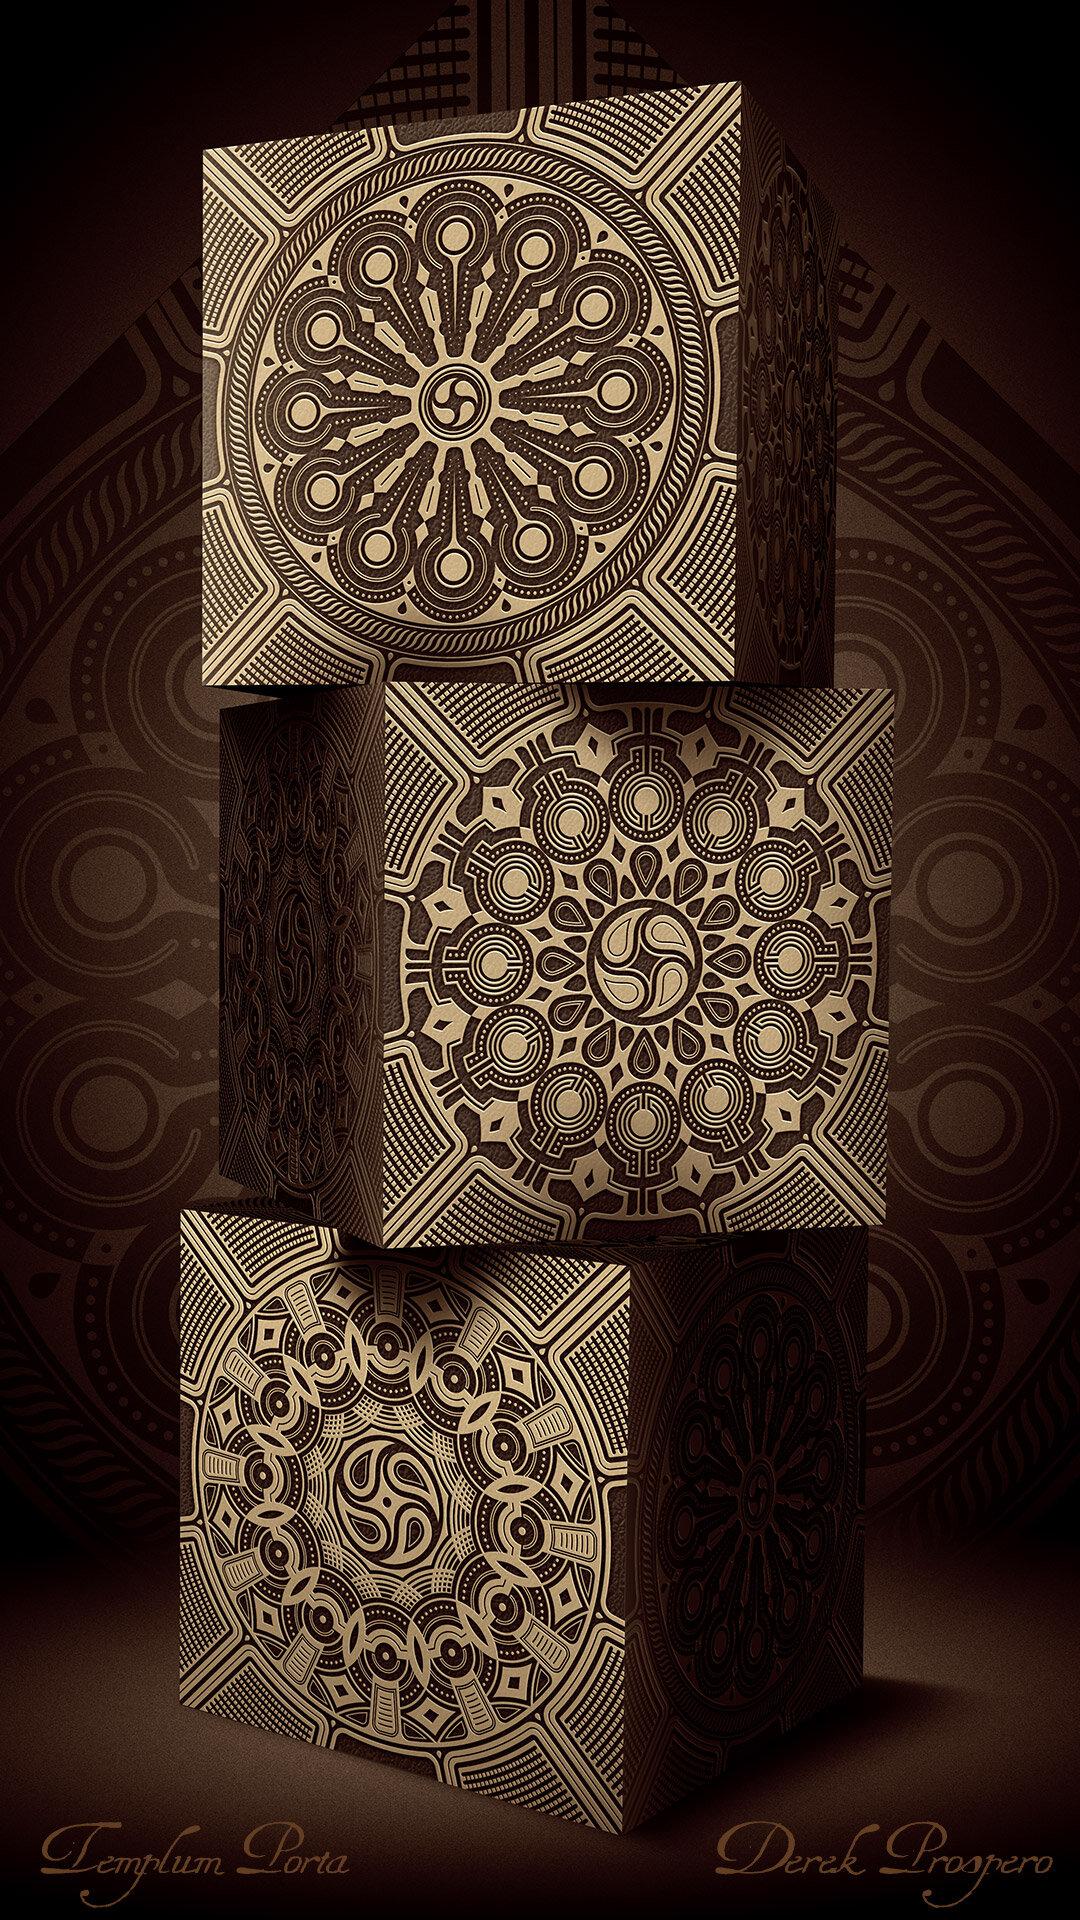 cube-templum-2.jpg